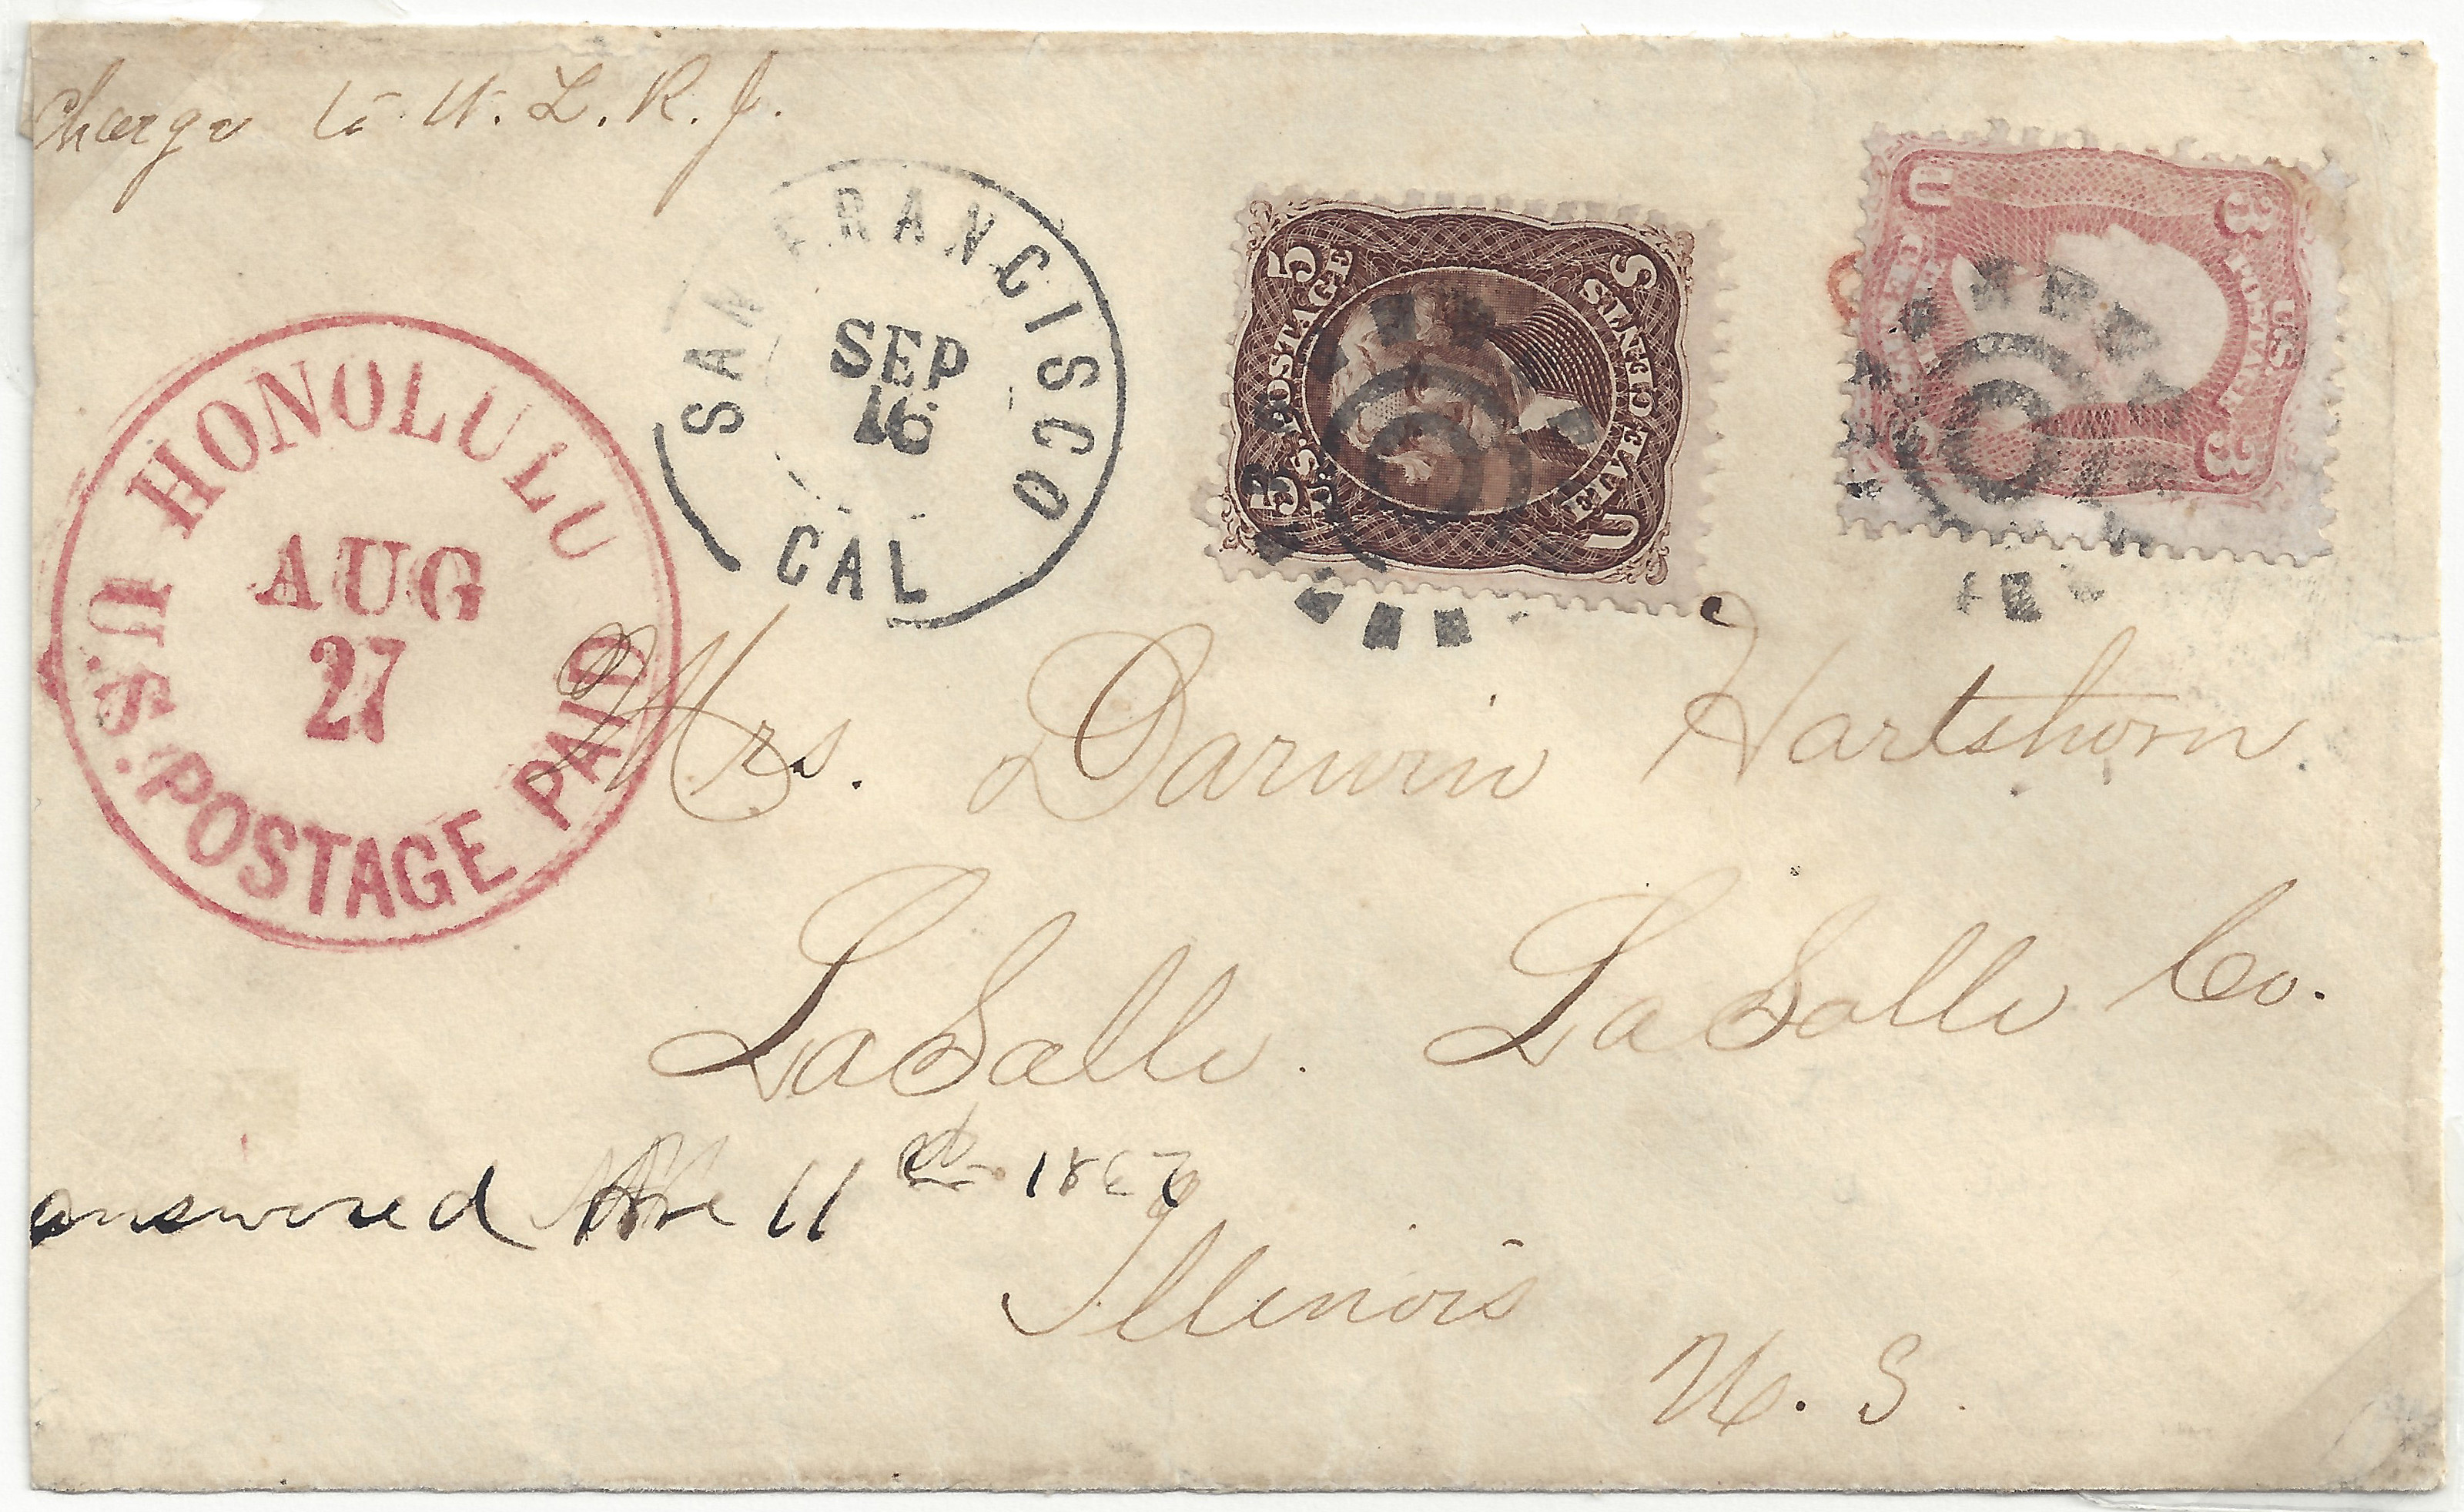 Suburban 20141015 5 022B 2xs Rate Hon Aug 27, 1867 (65 68)